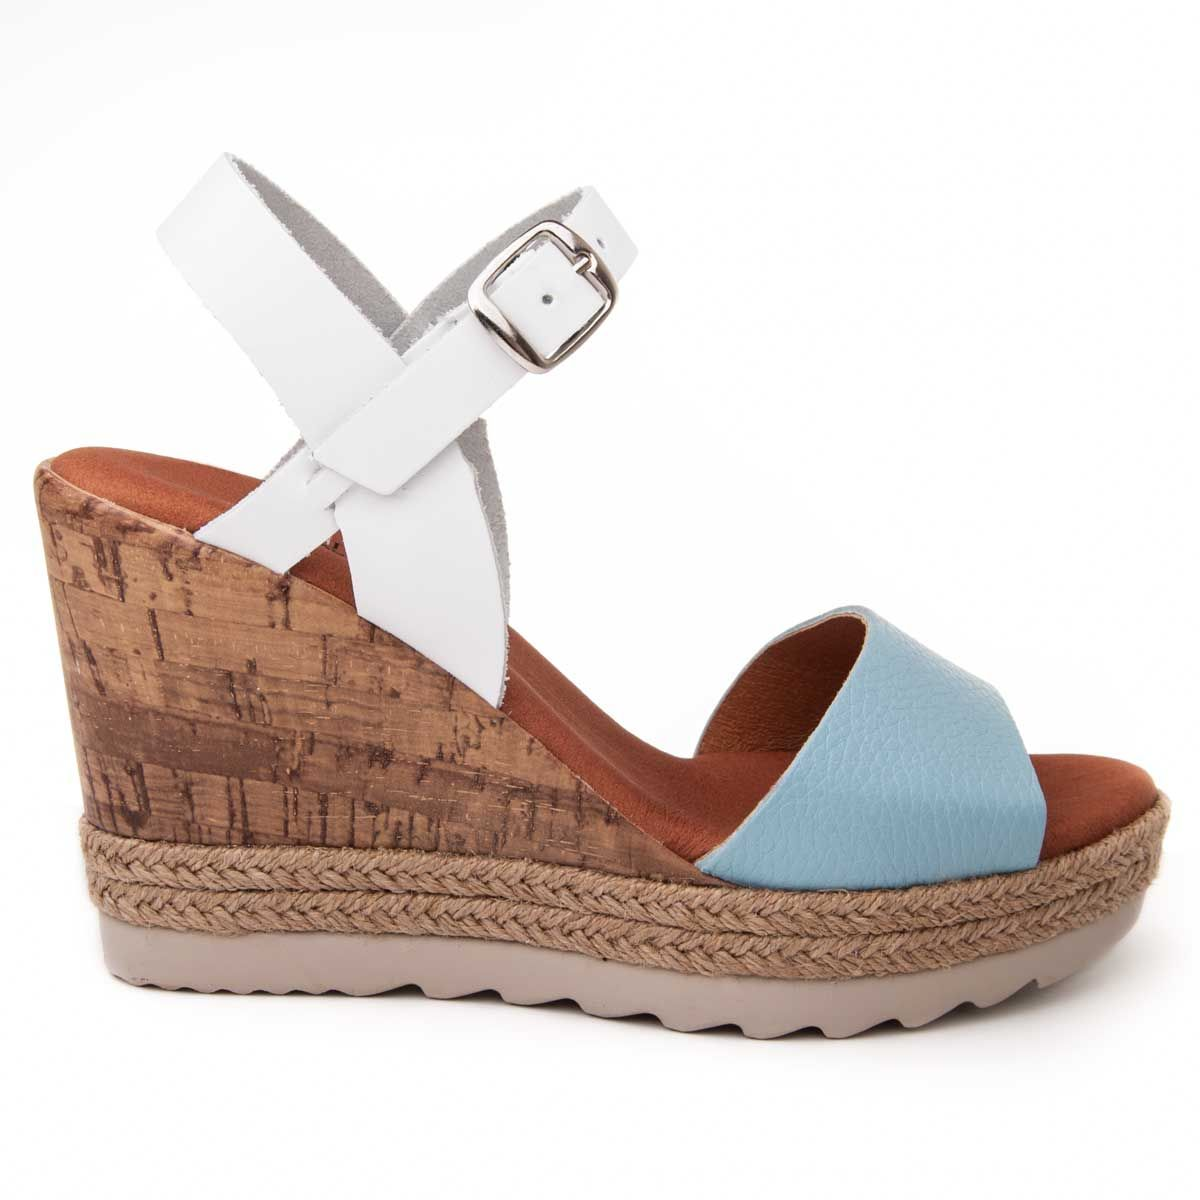 Purapiel Platform Sandal in Blue